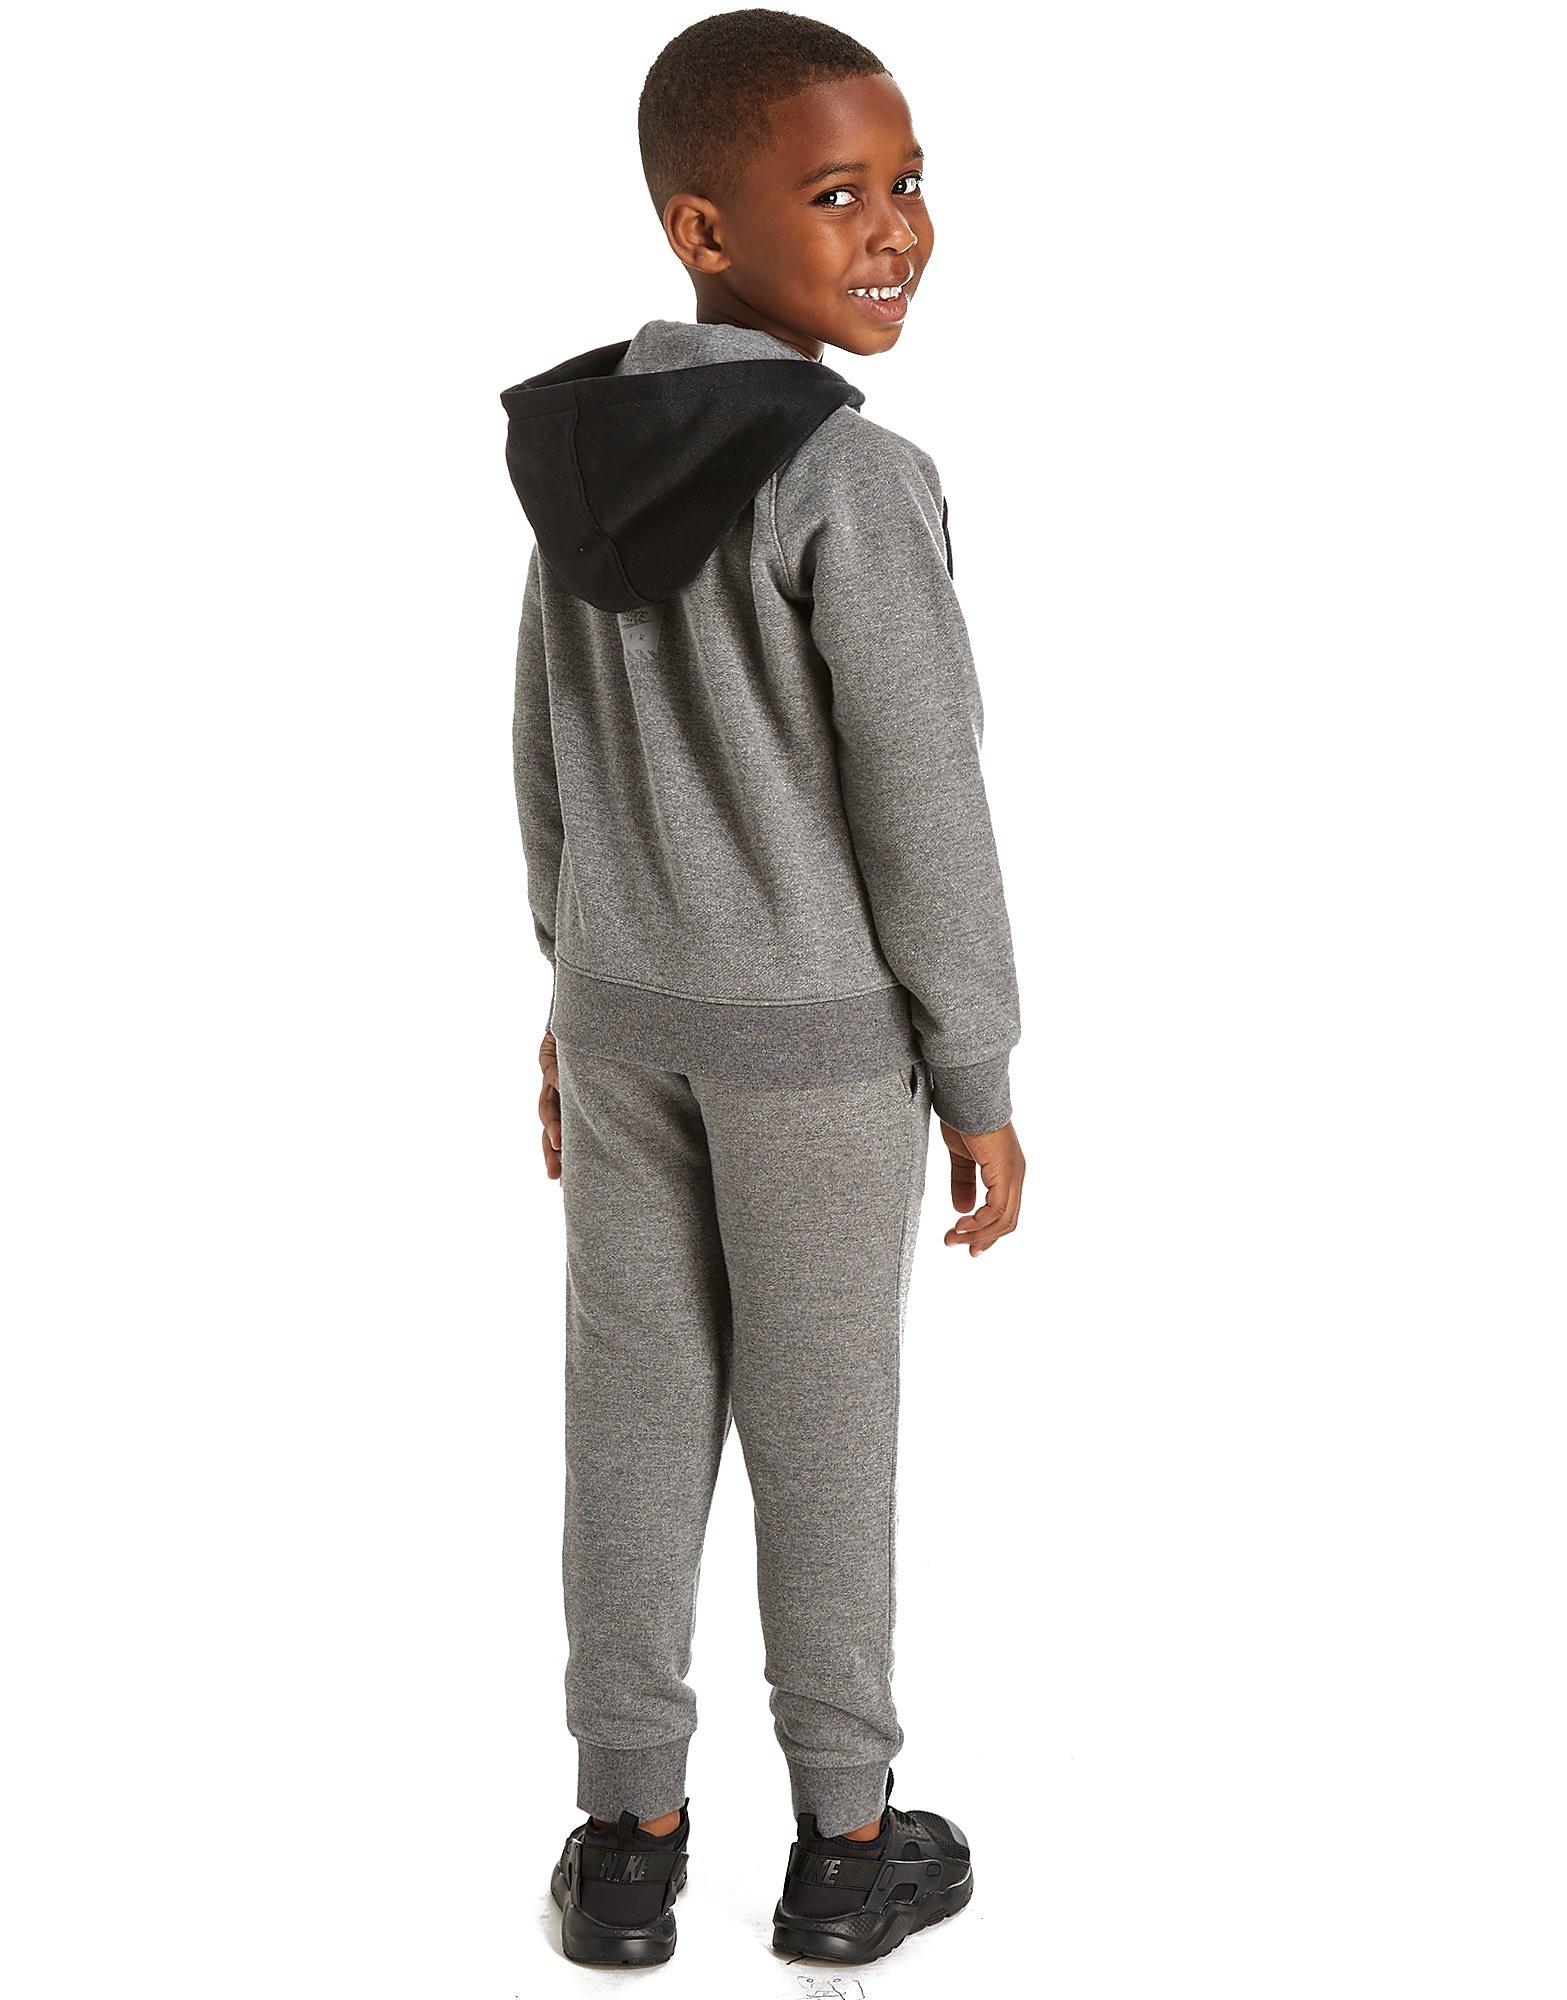 Nike Air Full Zip Tuta da Ginnastica Bambino